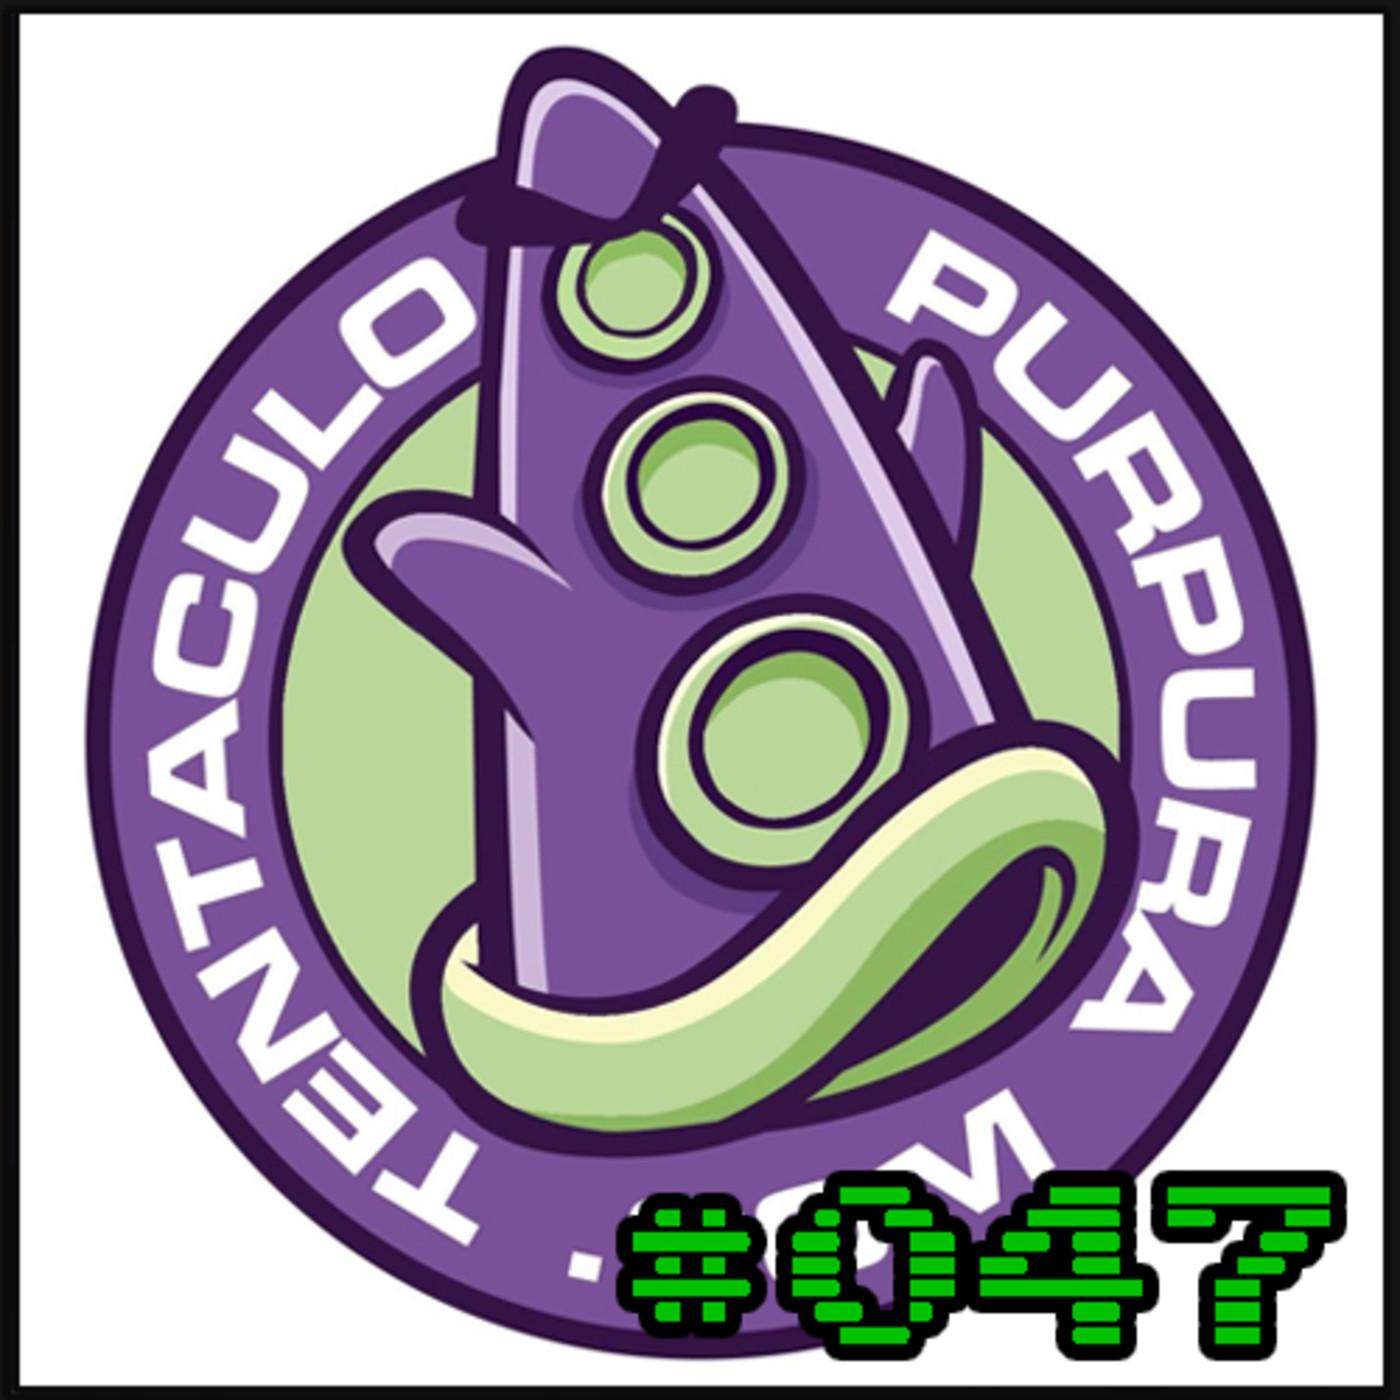 GM Podcast #047 - Youtube & Tentaculo Purpura